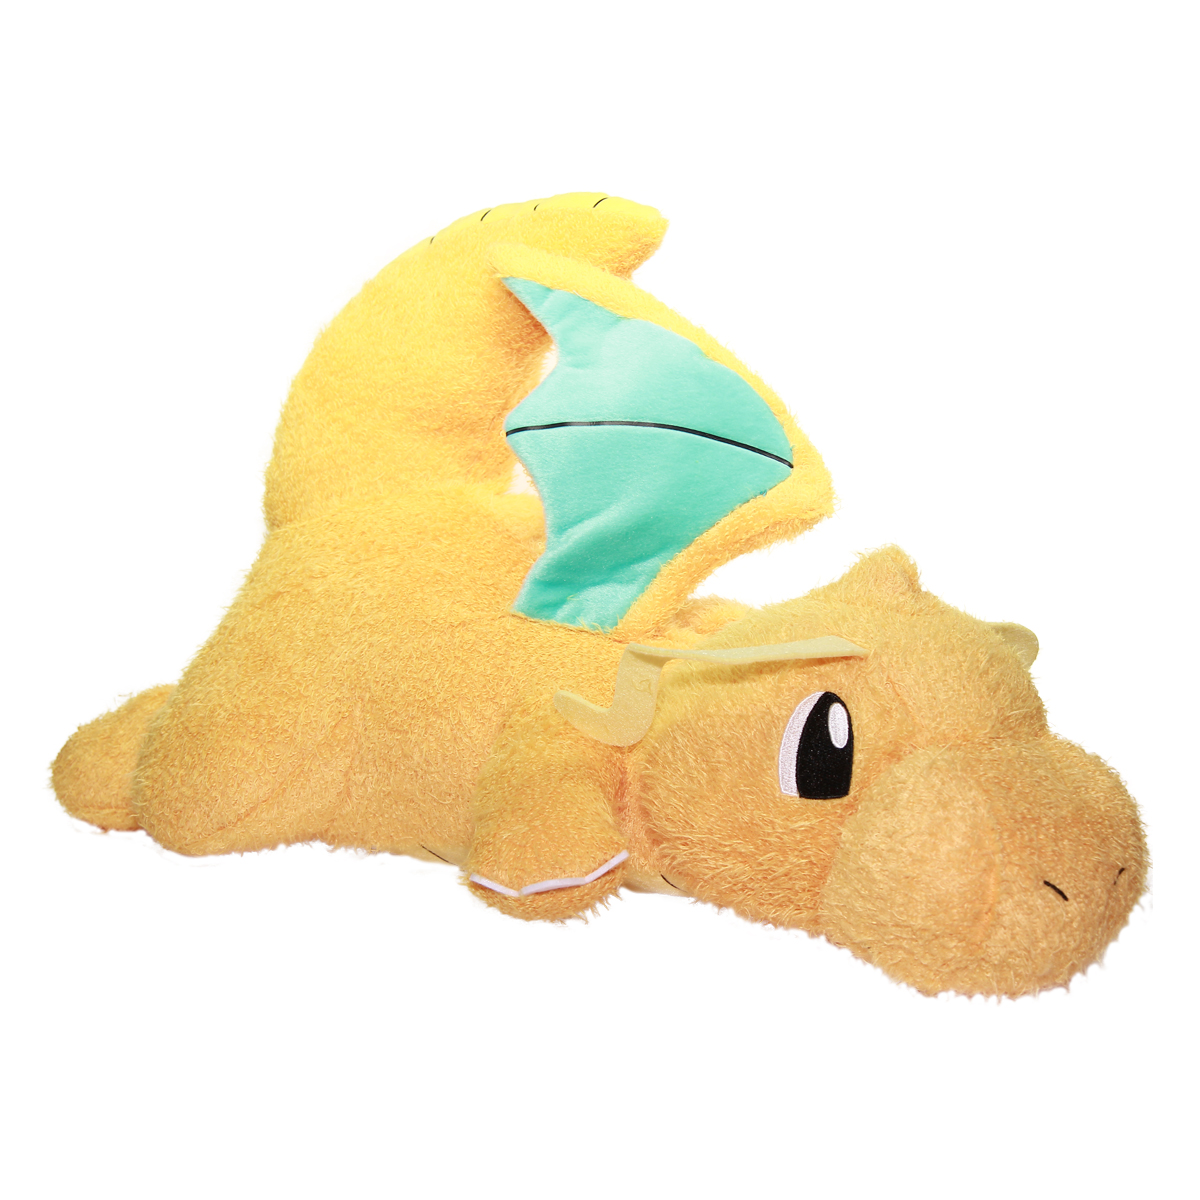 Pokemon Fuzzy Dragonite Plush Doll 18 Inches Bandai Spirits Banpresto